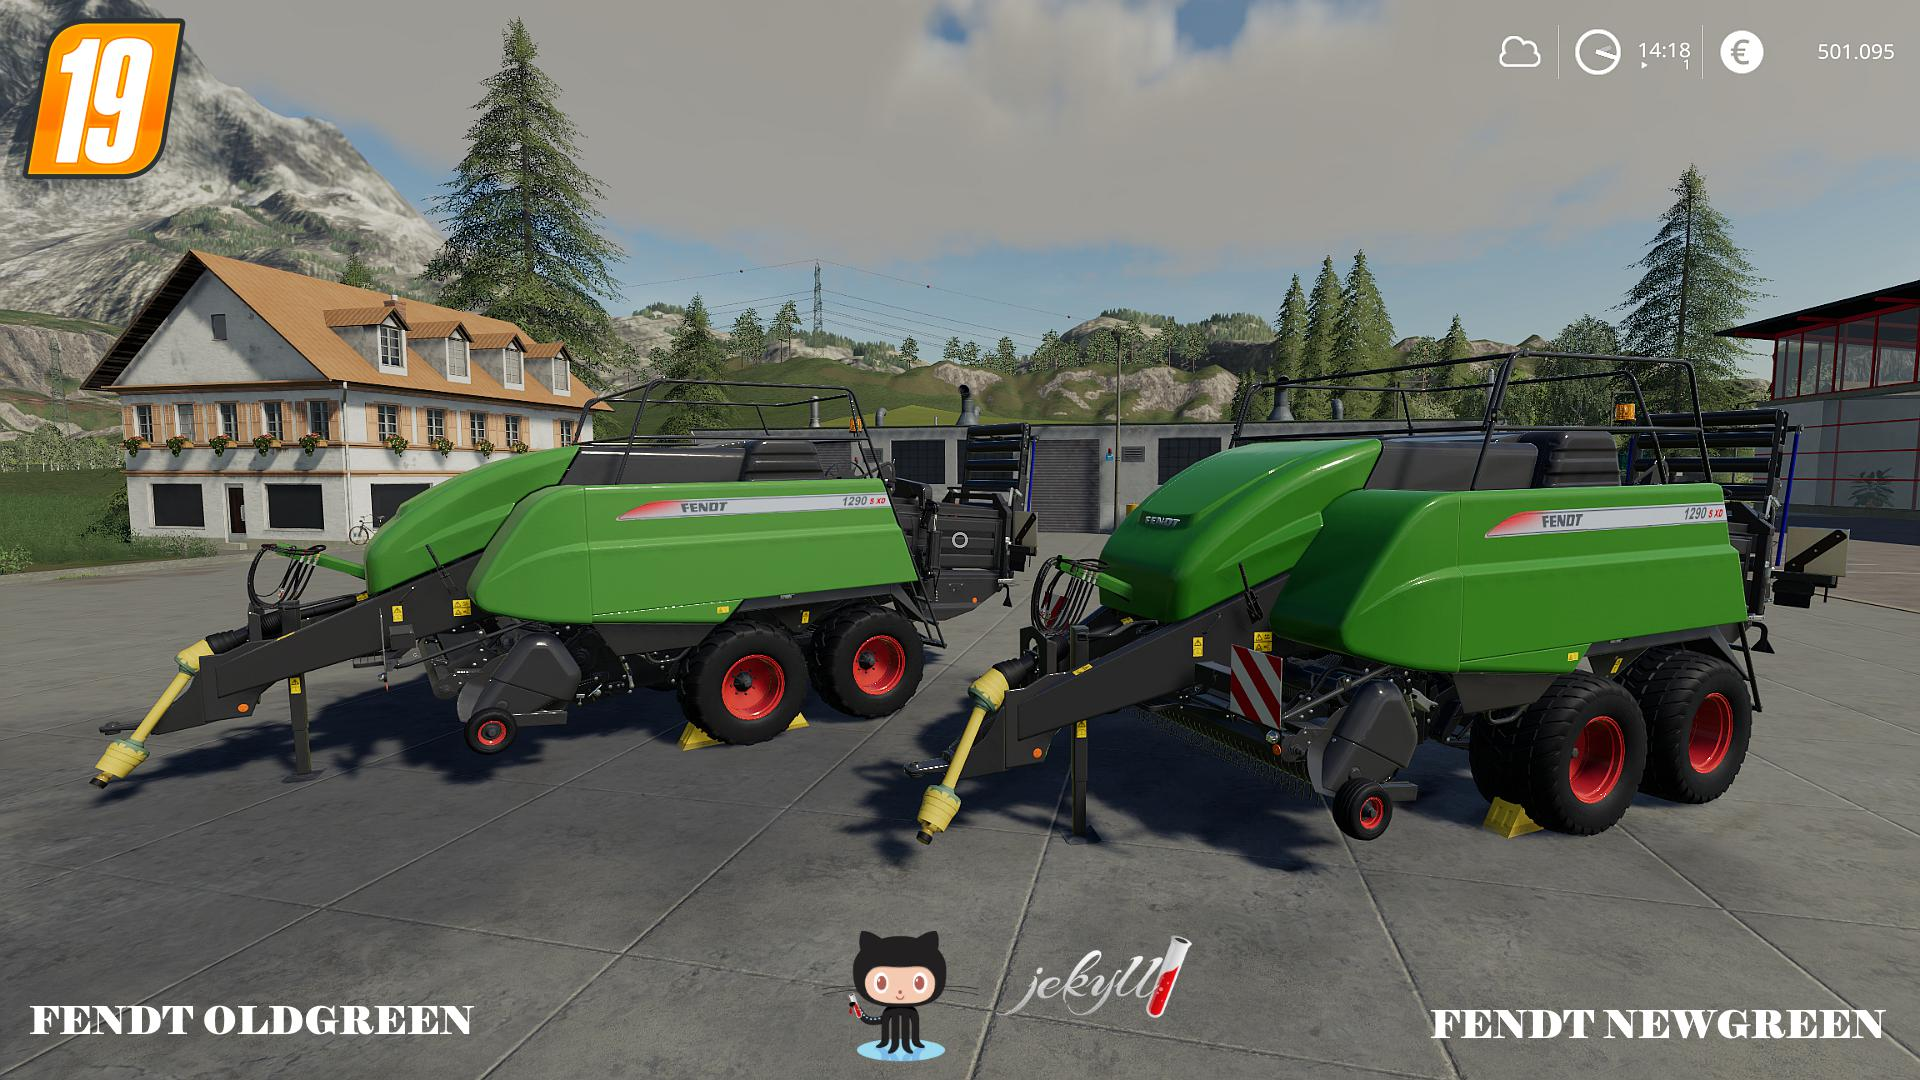 Fendt 1290S XD v1 0 FS19 - Farming Simulator 19 Mod   FS19 mod